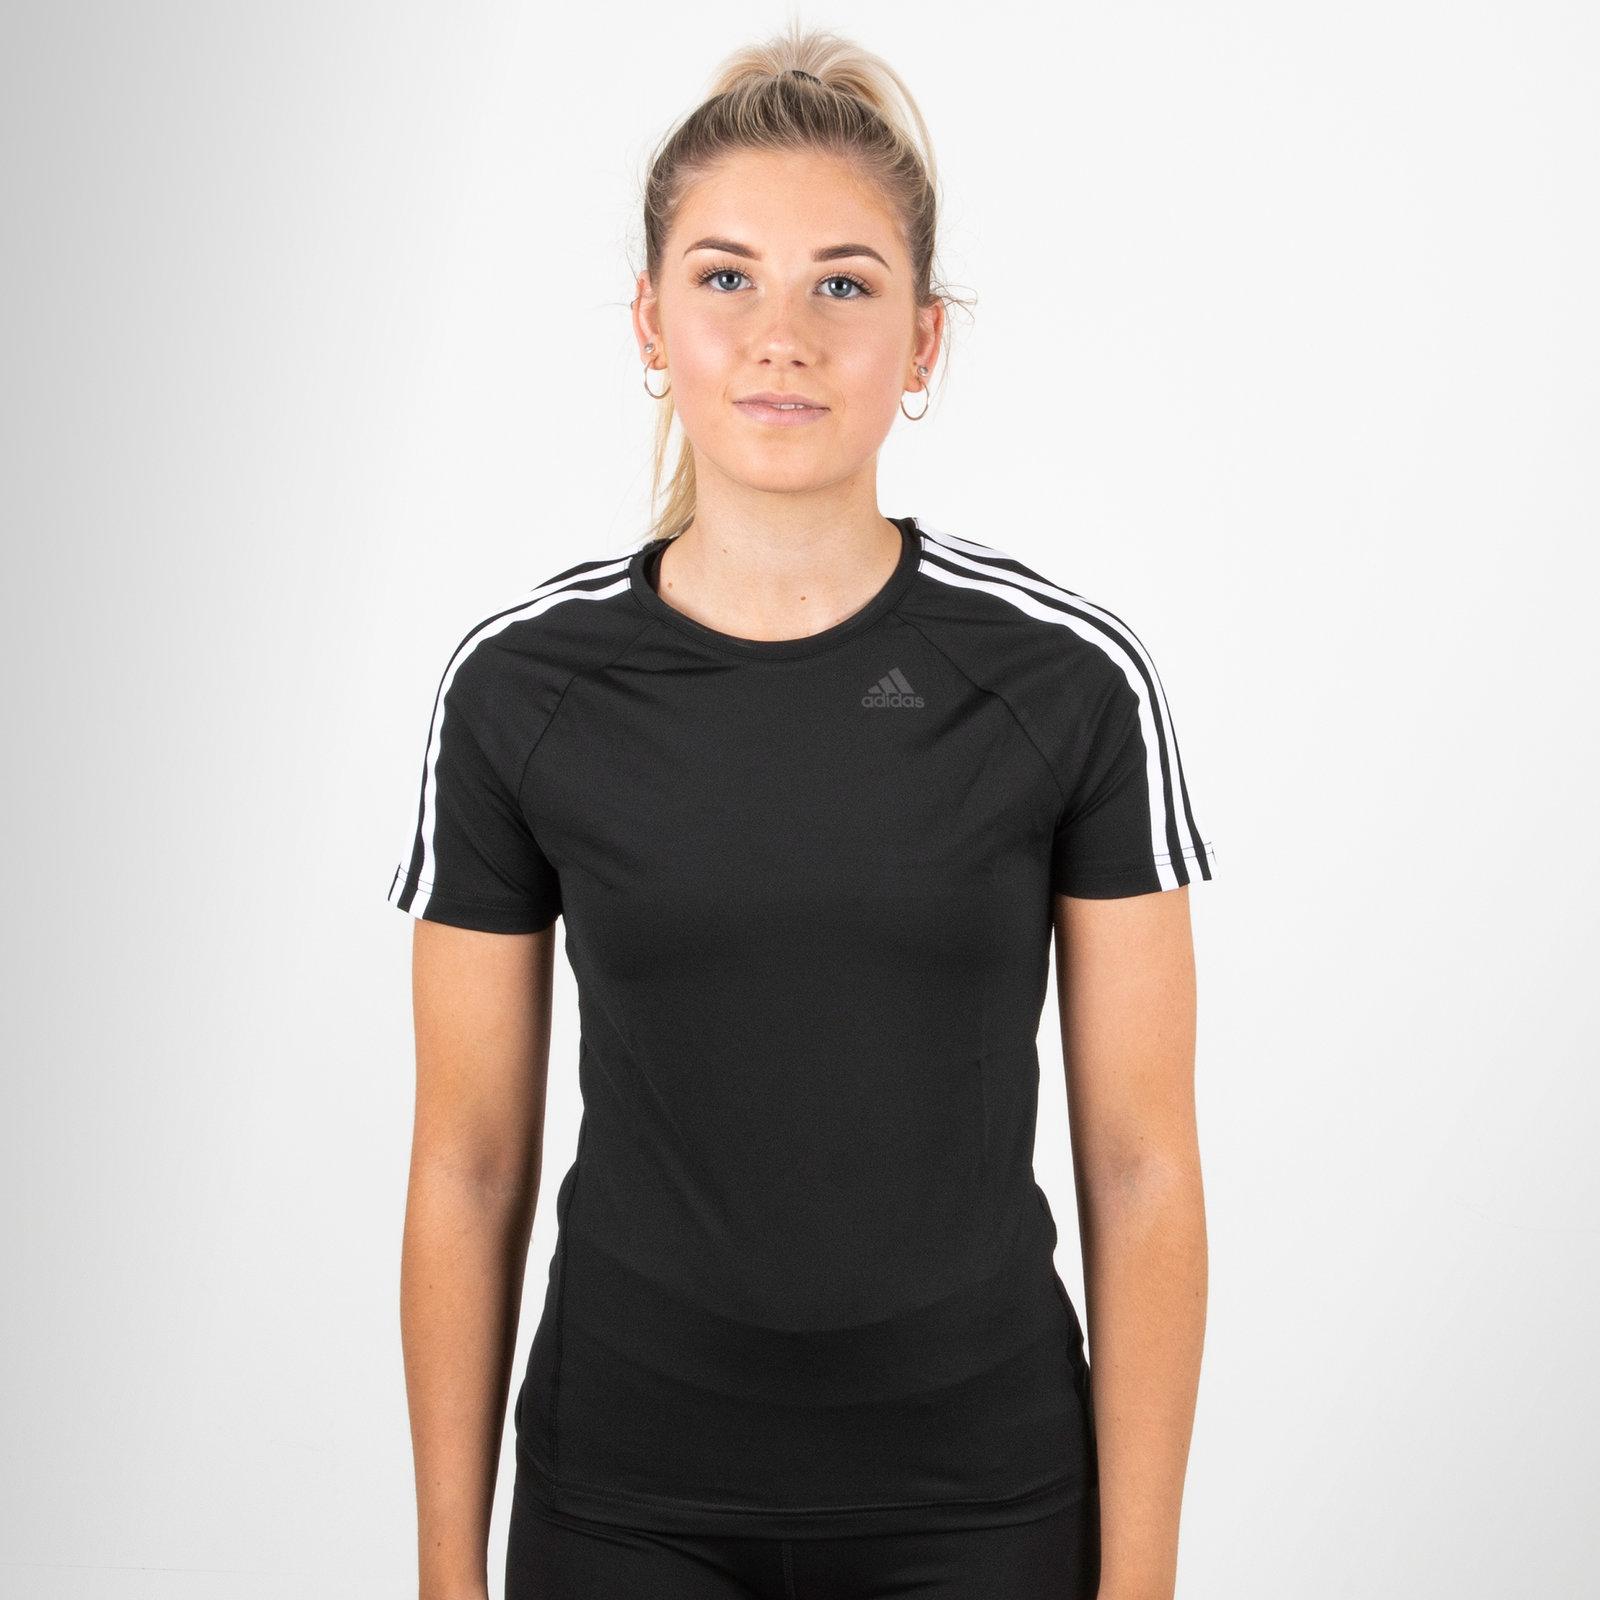 97aa745a40 adidas Womens D2M Ladies 3 Stripes Training T-Shirt Black Top Sports ...